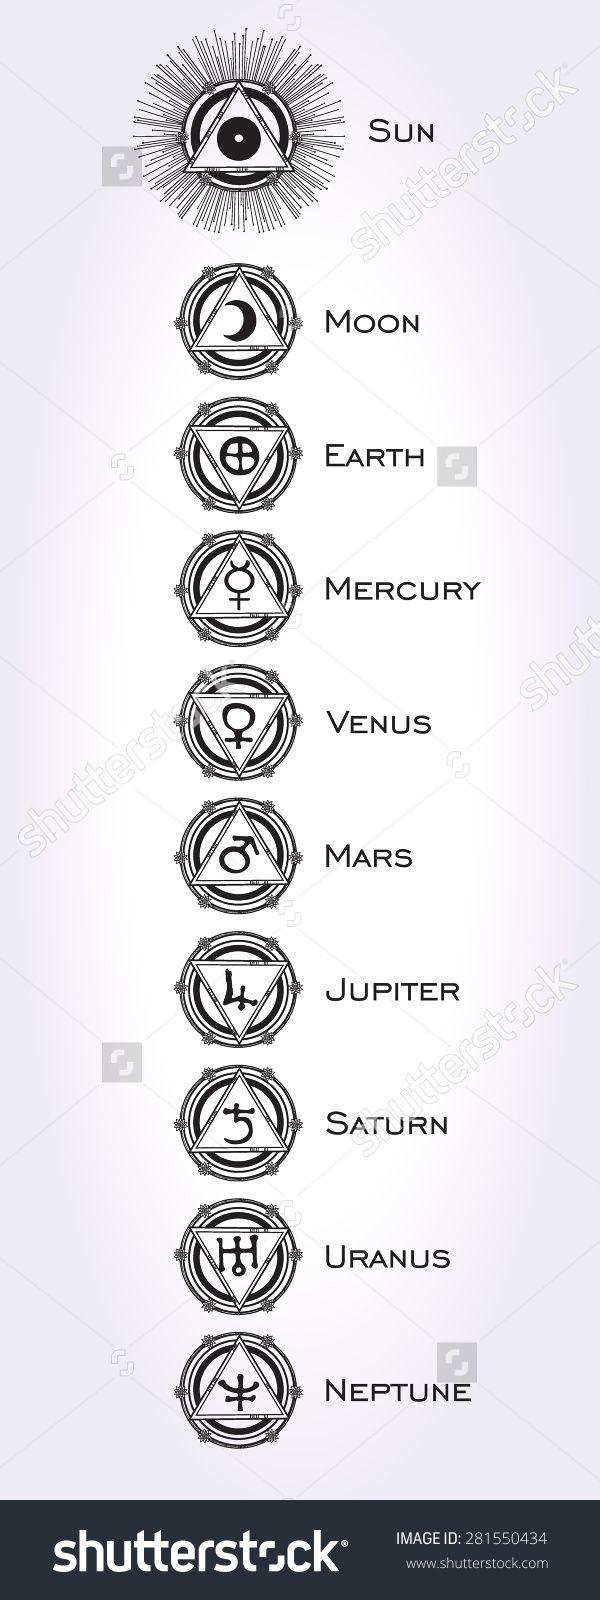 planet symbol tattoos - Google Search